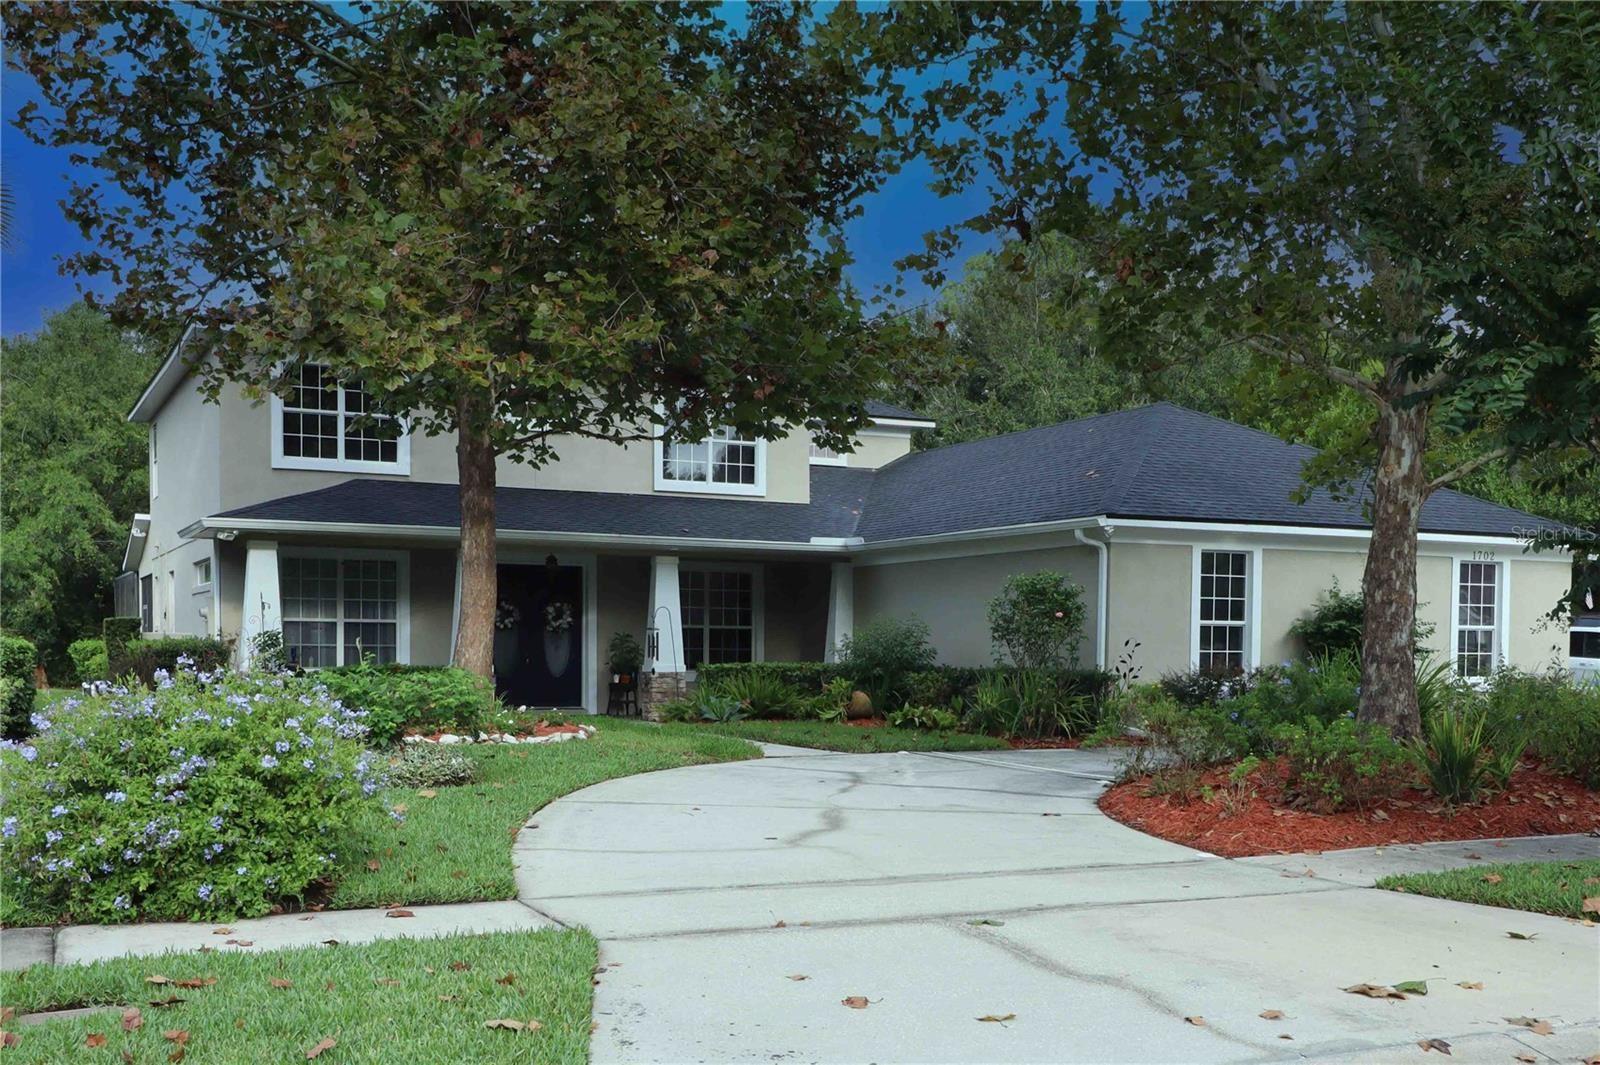 1702 BILLINGSHURST COURT, Orlando, FL 32825 - #: O5969946